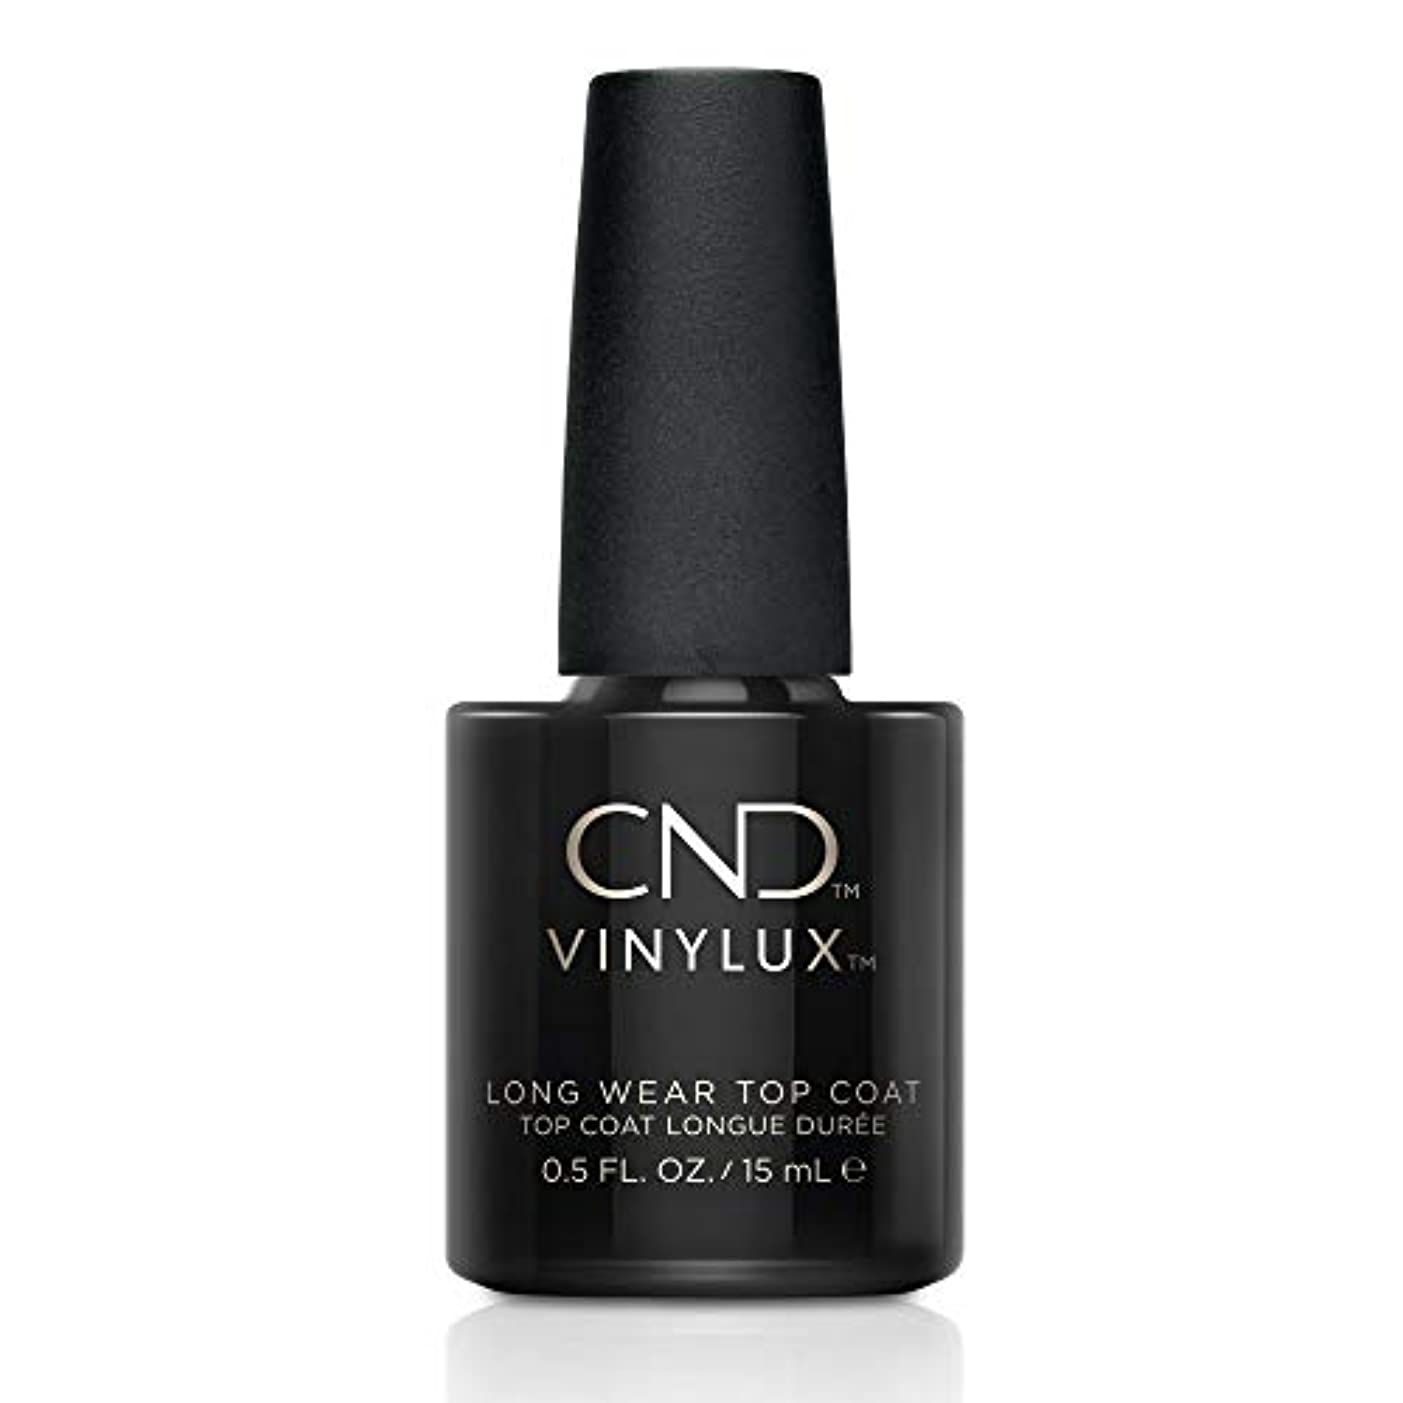 CND バイナラクス トップコート Long Wear Top Coat 15ml